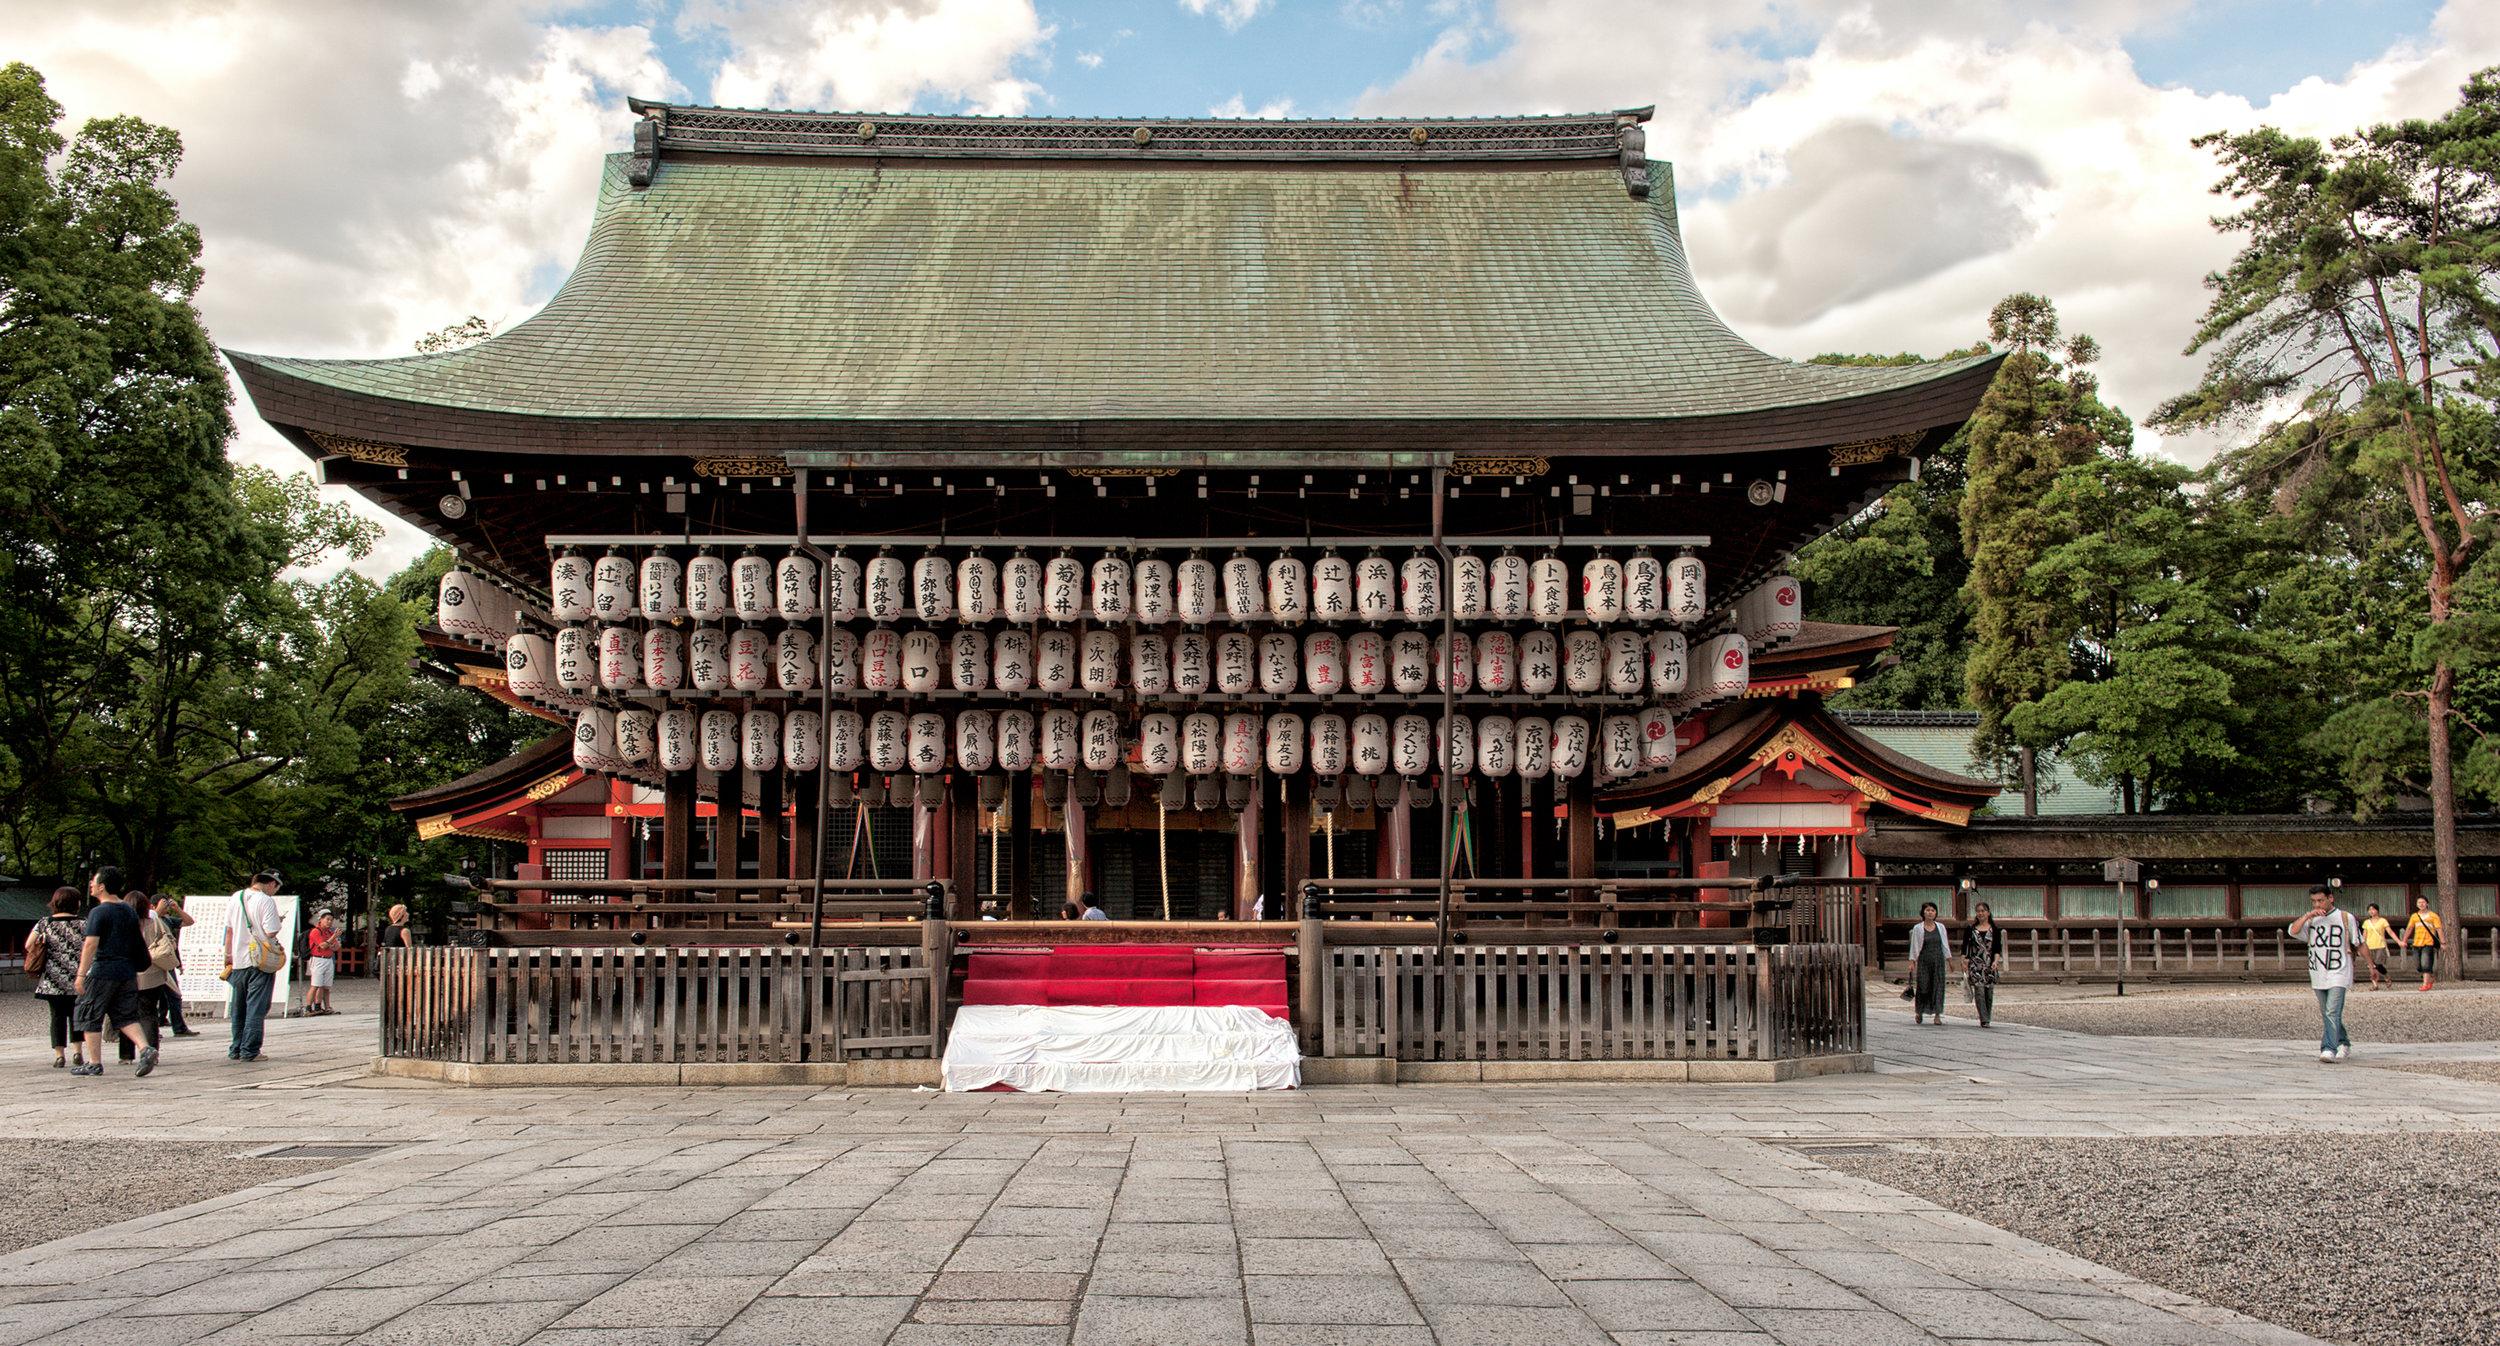 Japan-John Bardell-0334a.jpg